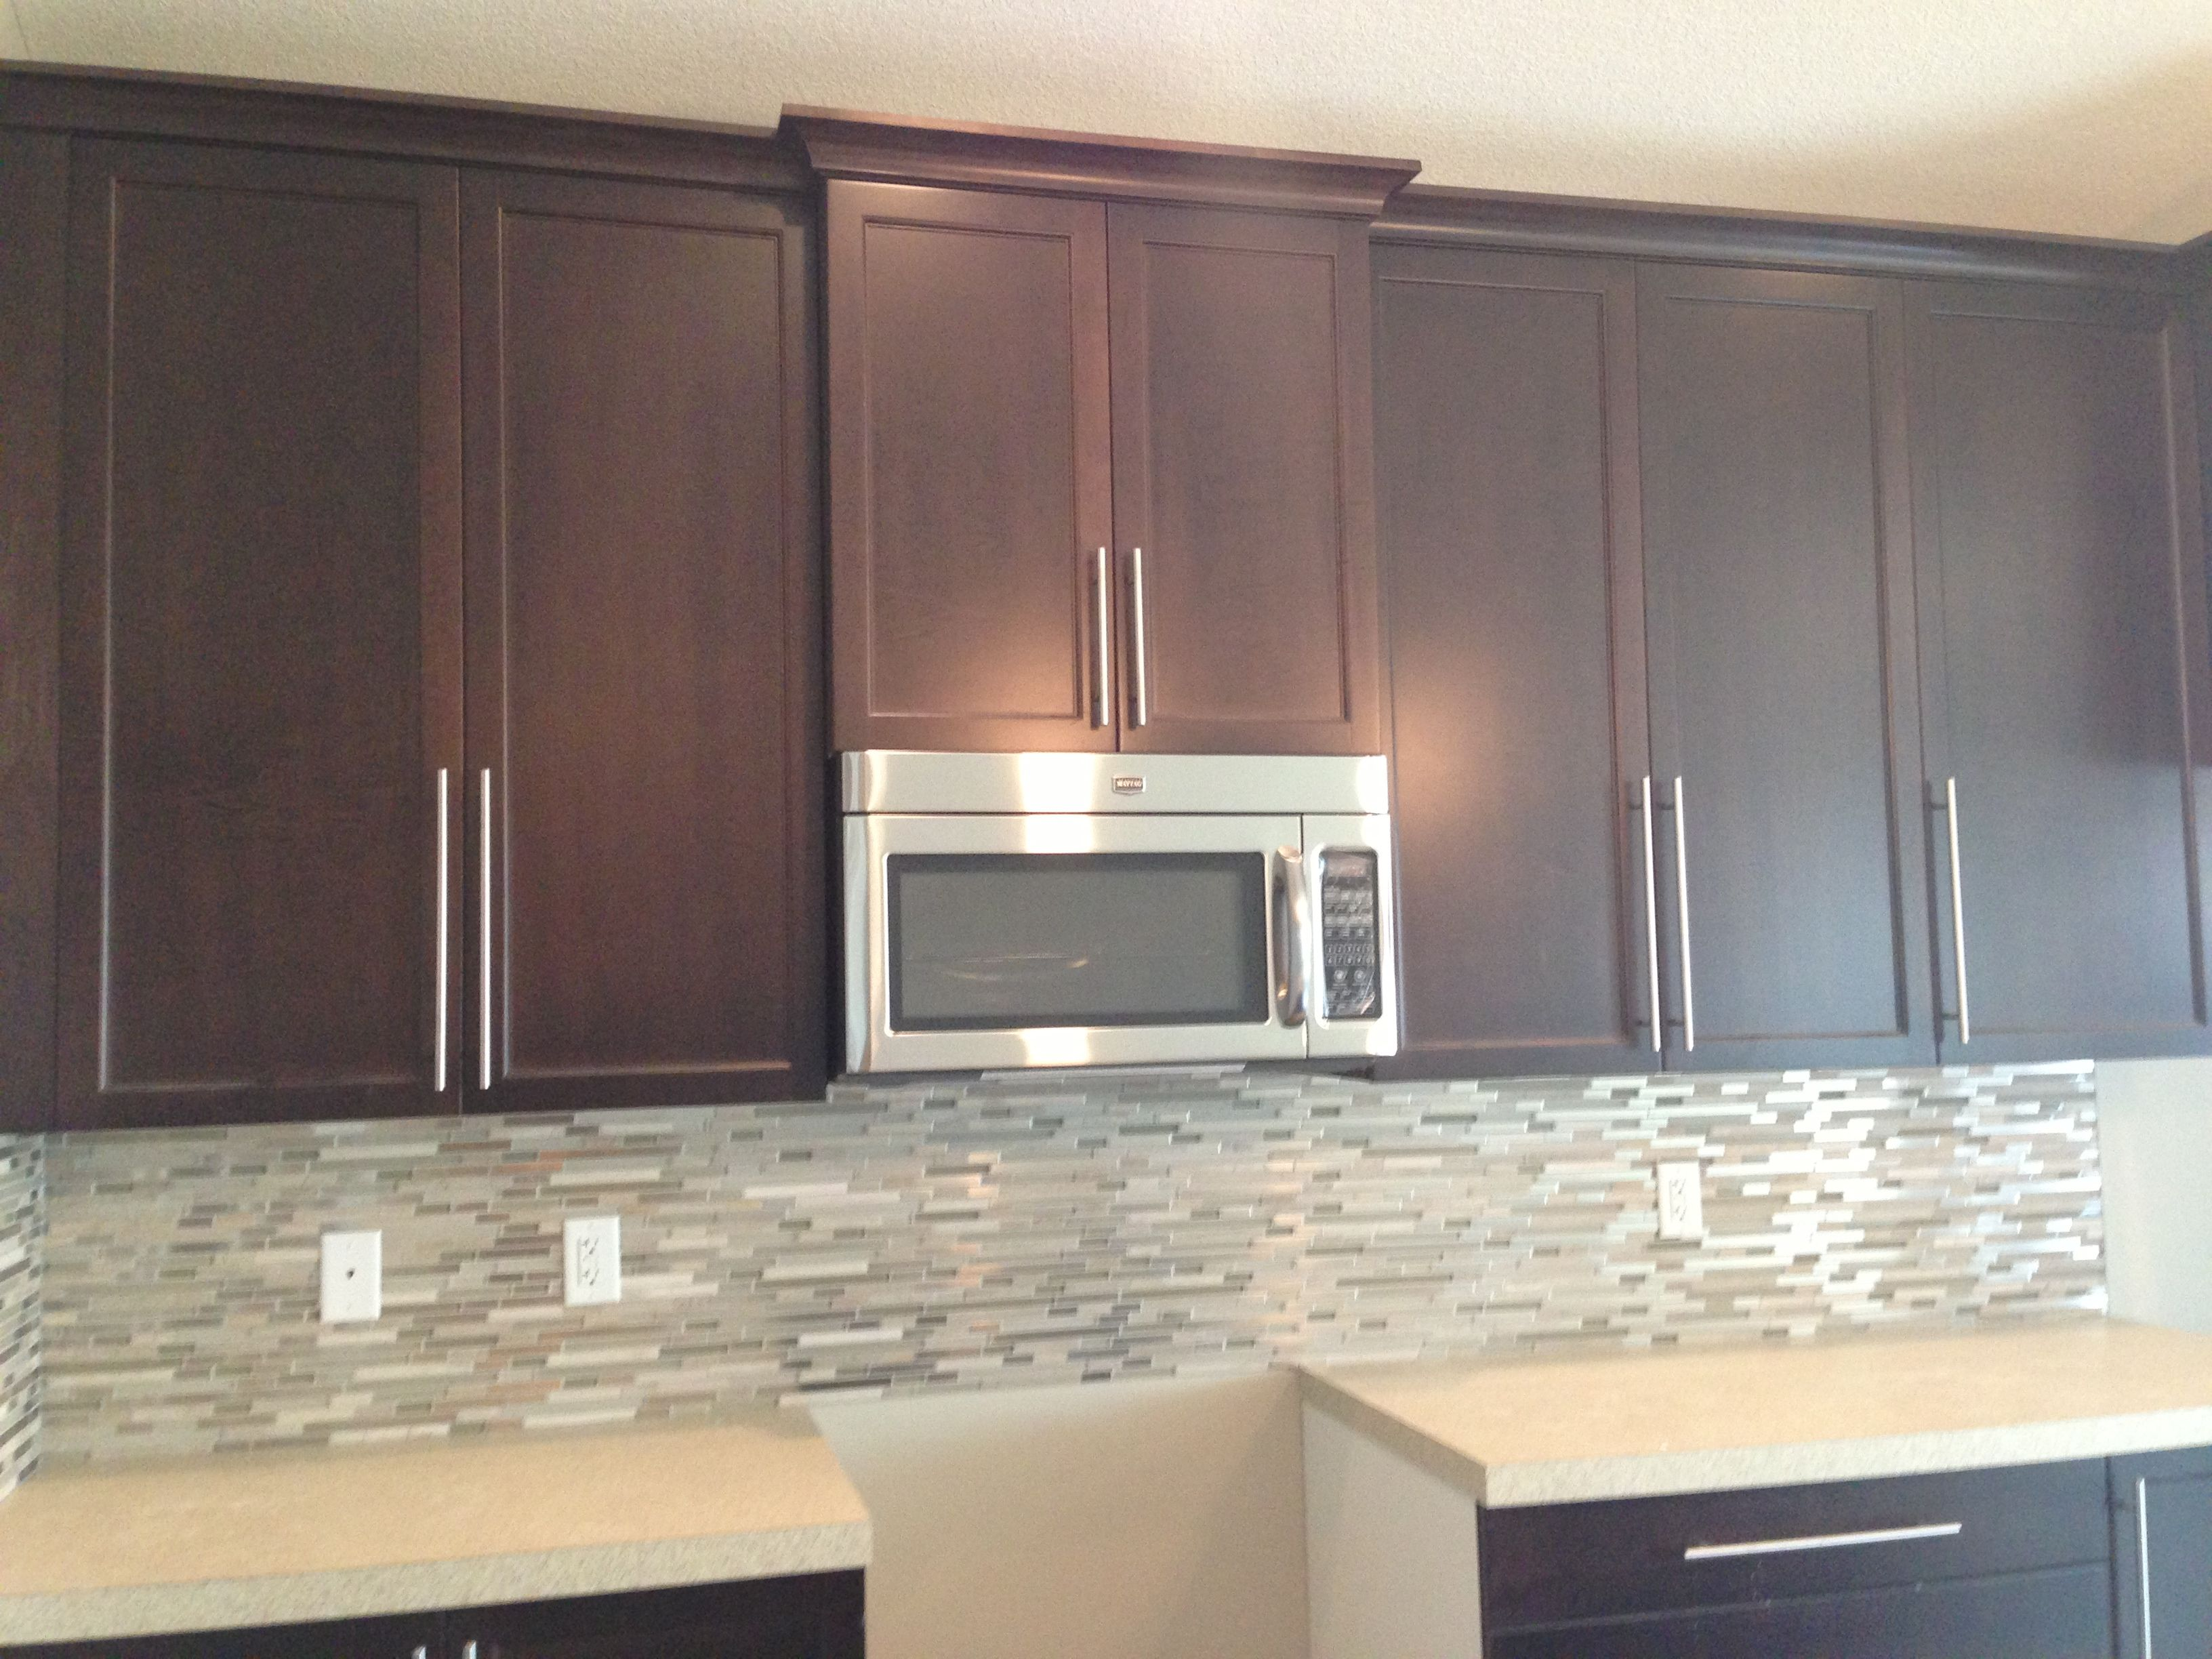 48 Inch Upper Cabinets With Clay Titanium Mosaic Tile Backsplash